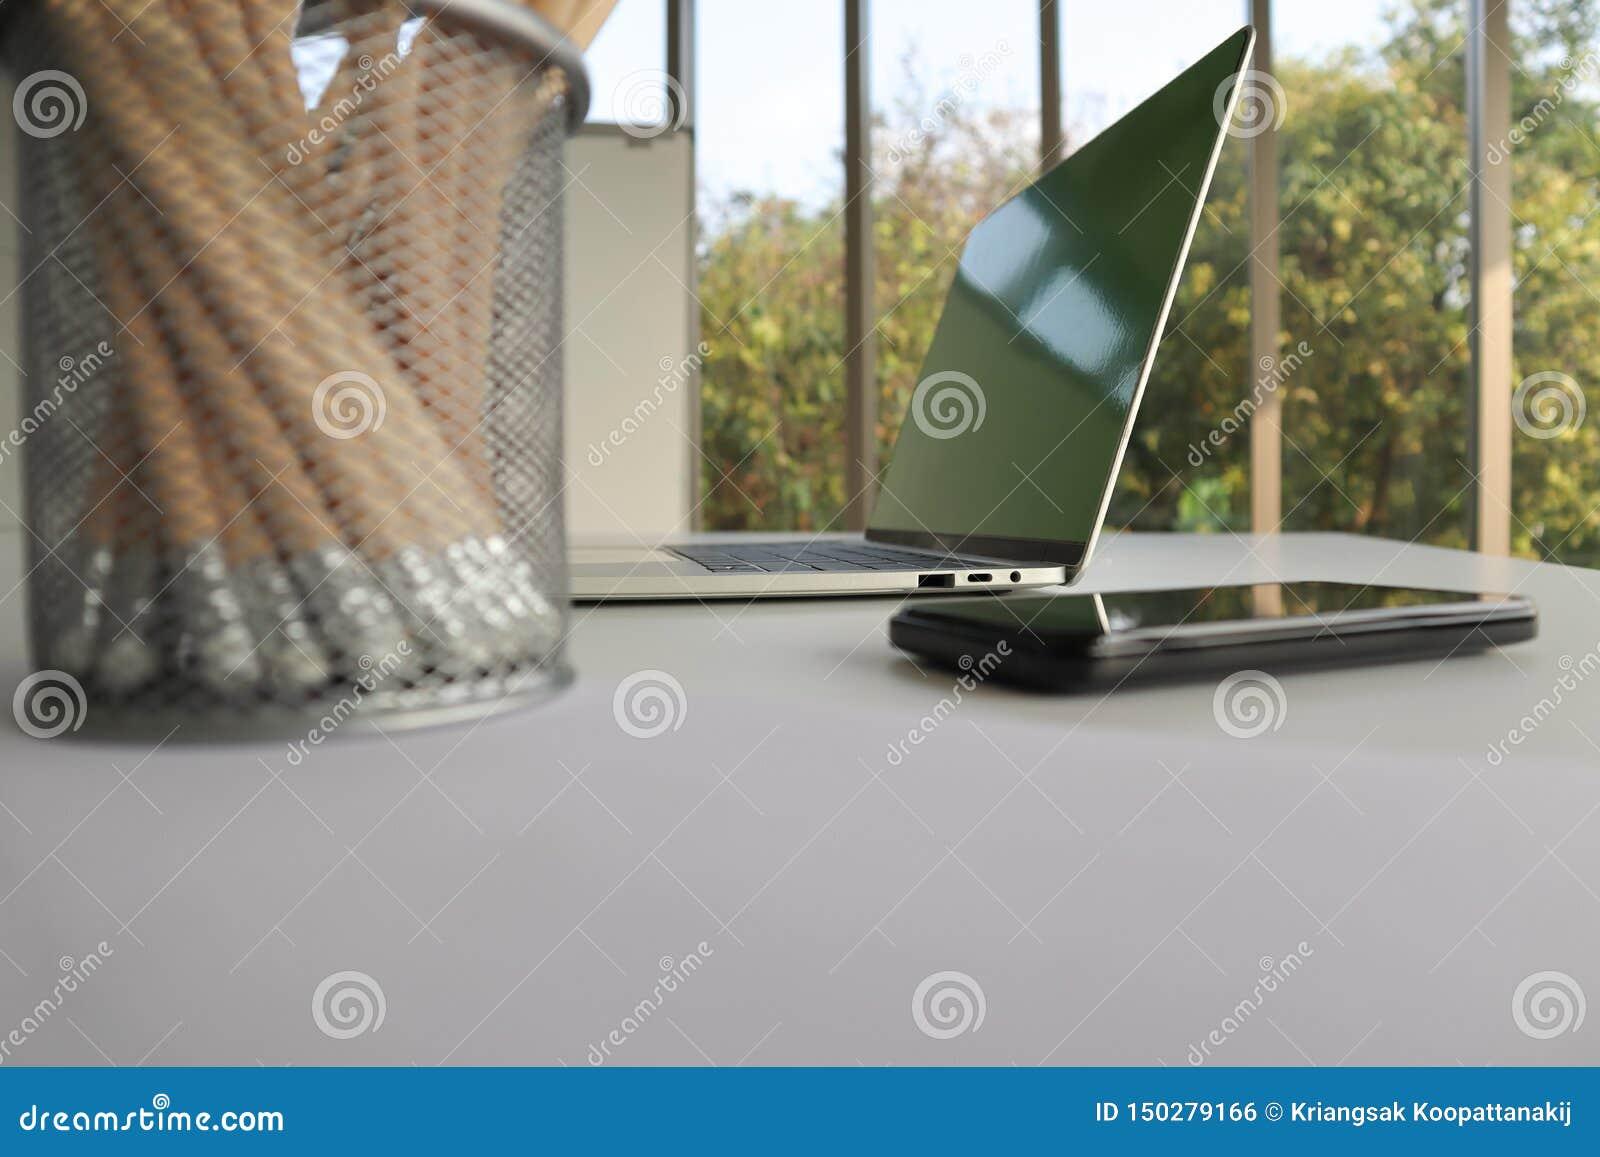 Portátil, telefone celular e lápis na mesa branca